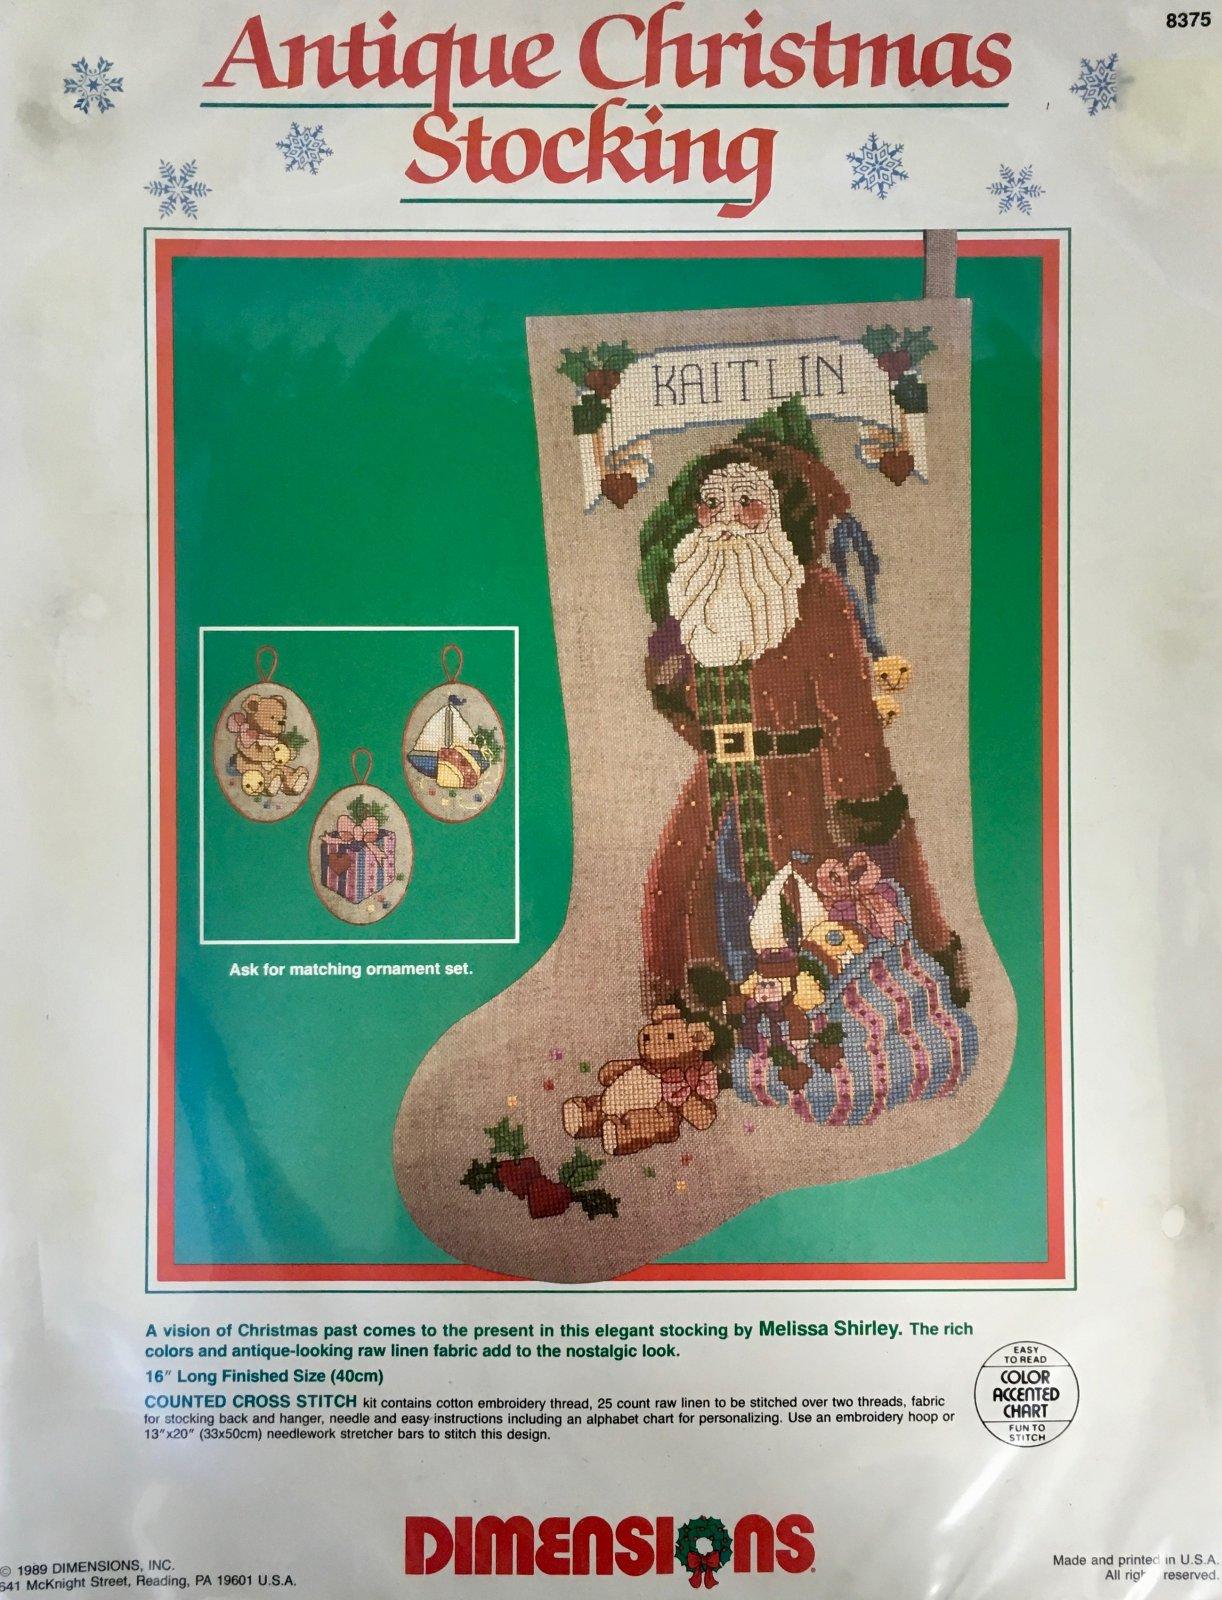 Antique Christmas Stocking Kit